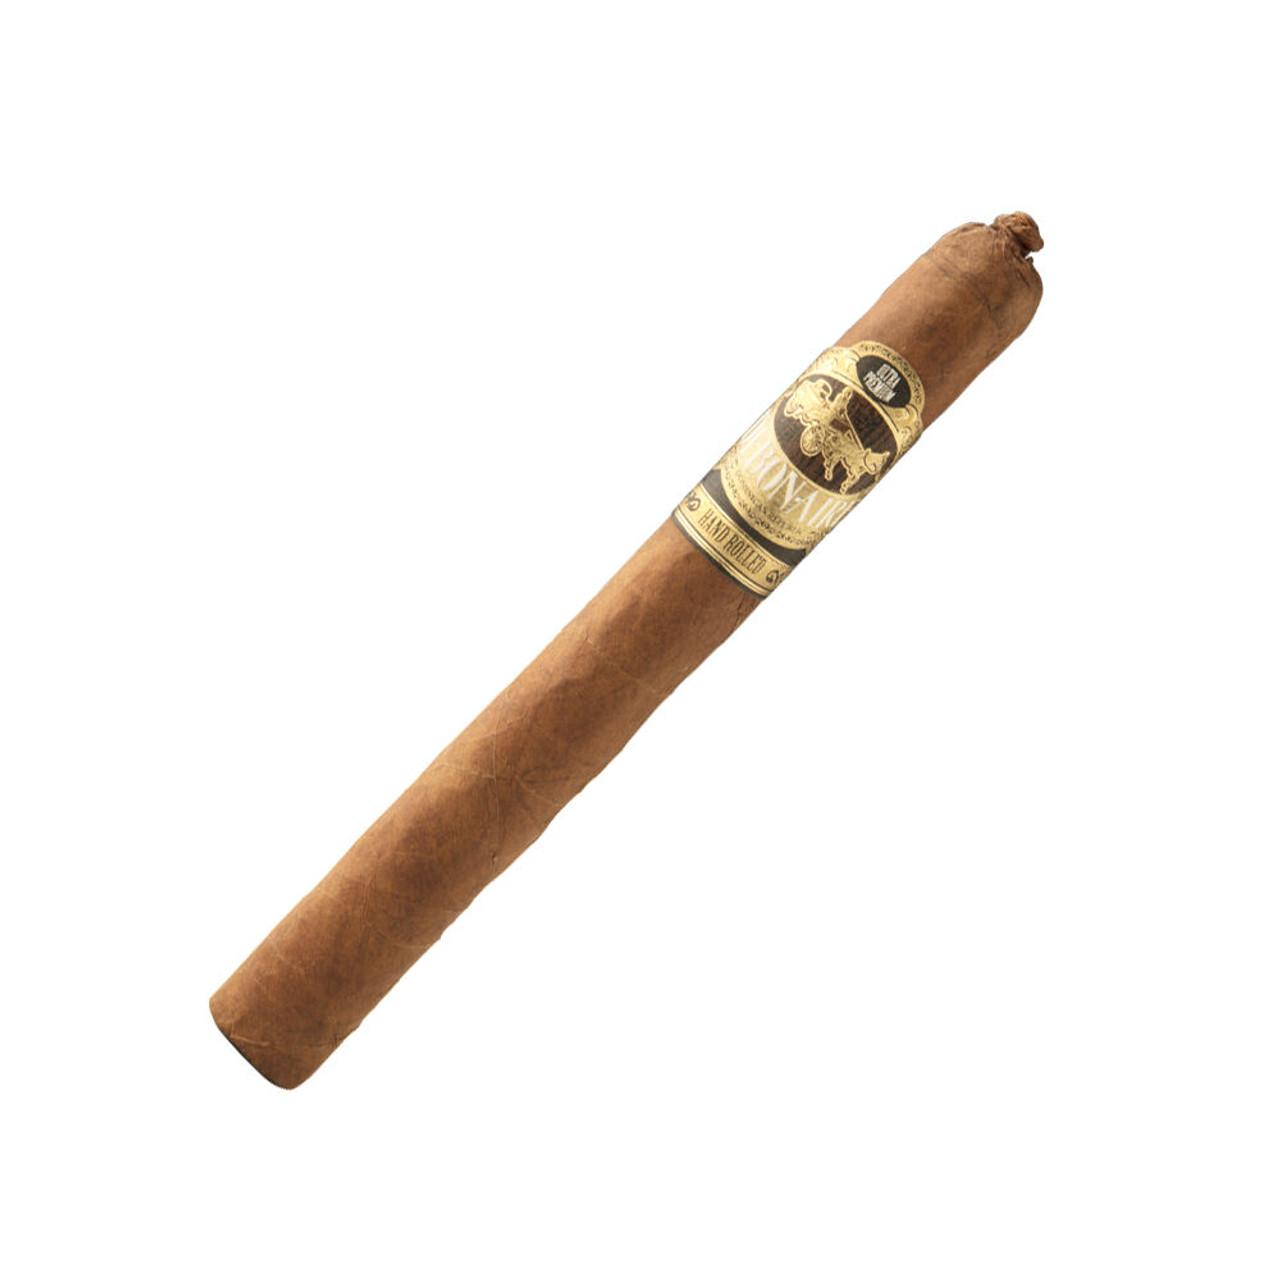 Debonaire Habano Petite Lancero Cigars - 5.5 x 38 (Box of 20)